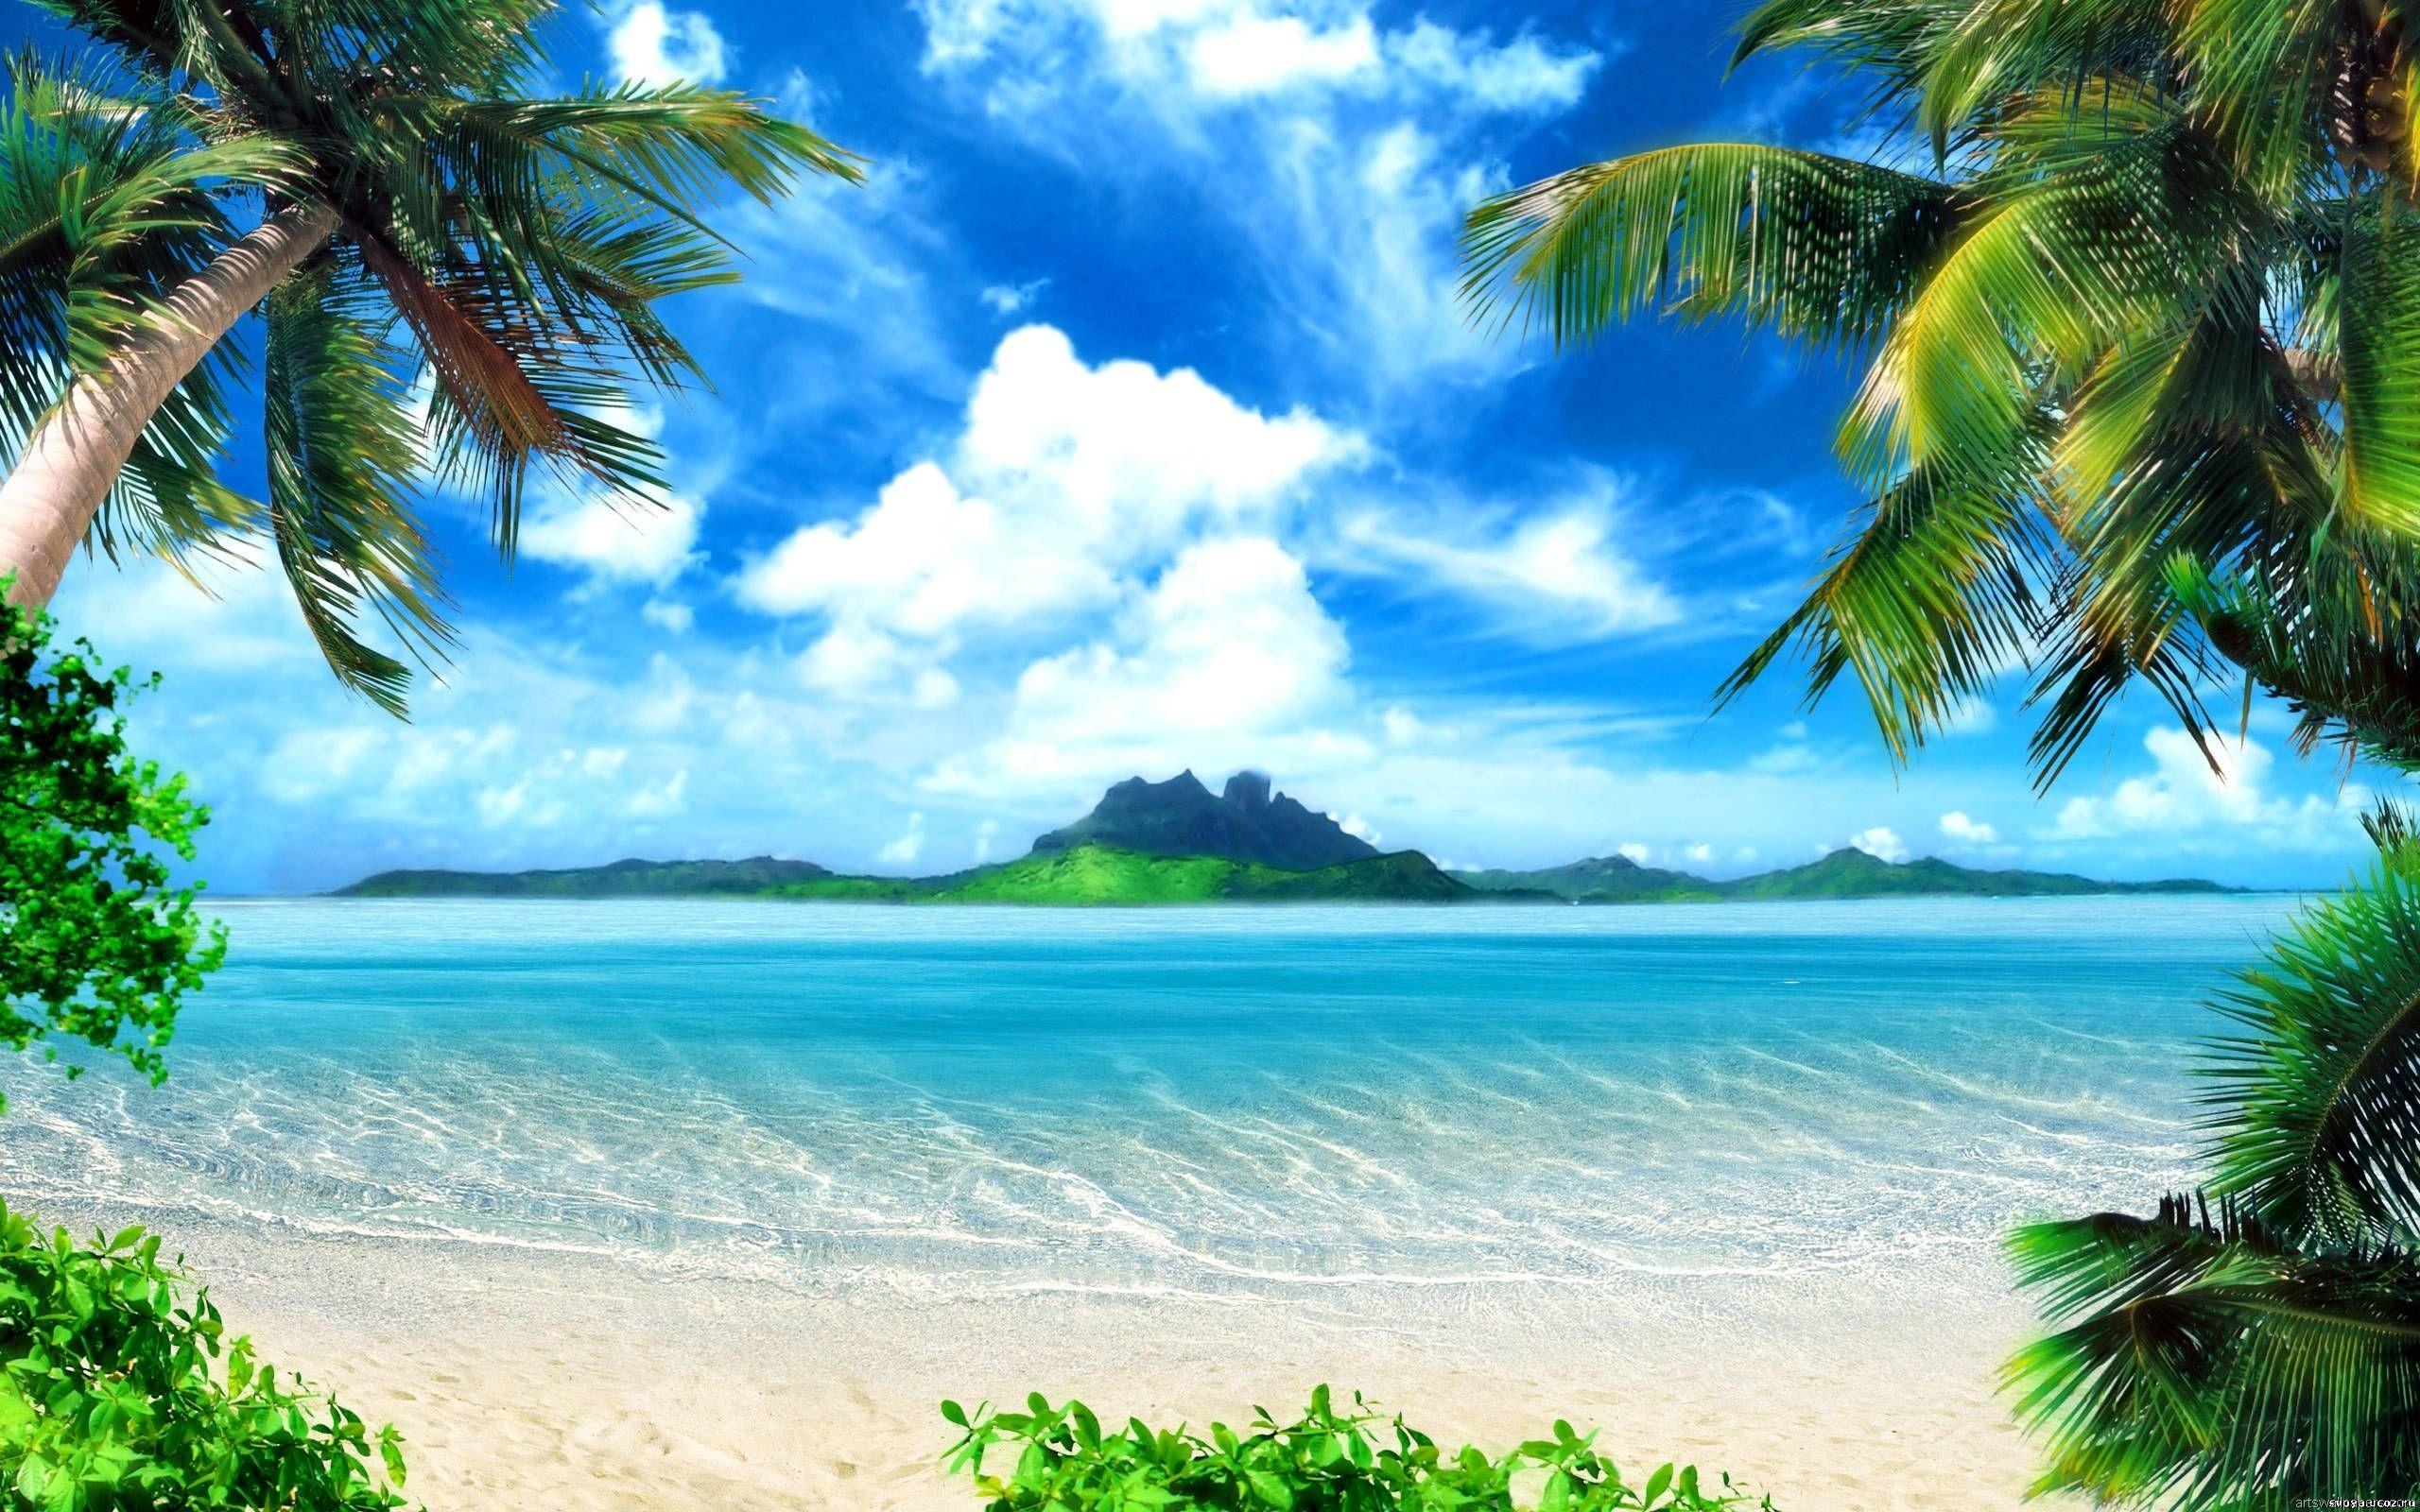 Res: 2560x1600, flowers on the beach   Sea Ocean Wallpaper, HD, Full HD 1080p, Desktop  Wallpaper, Background .